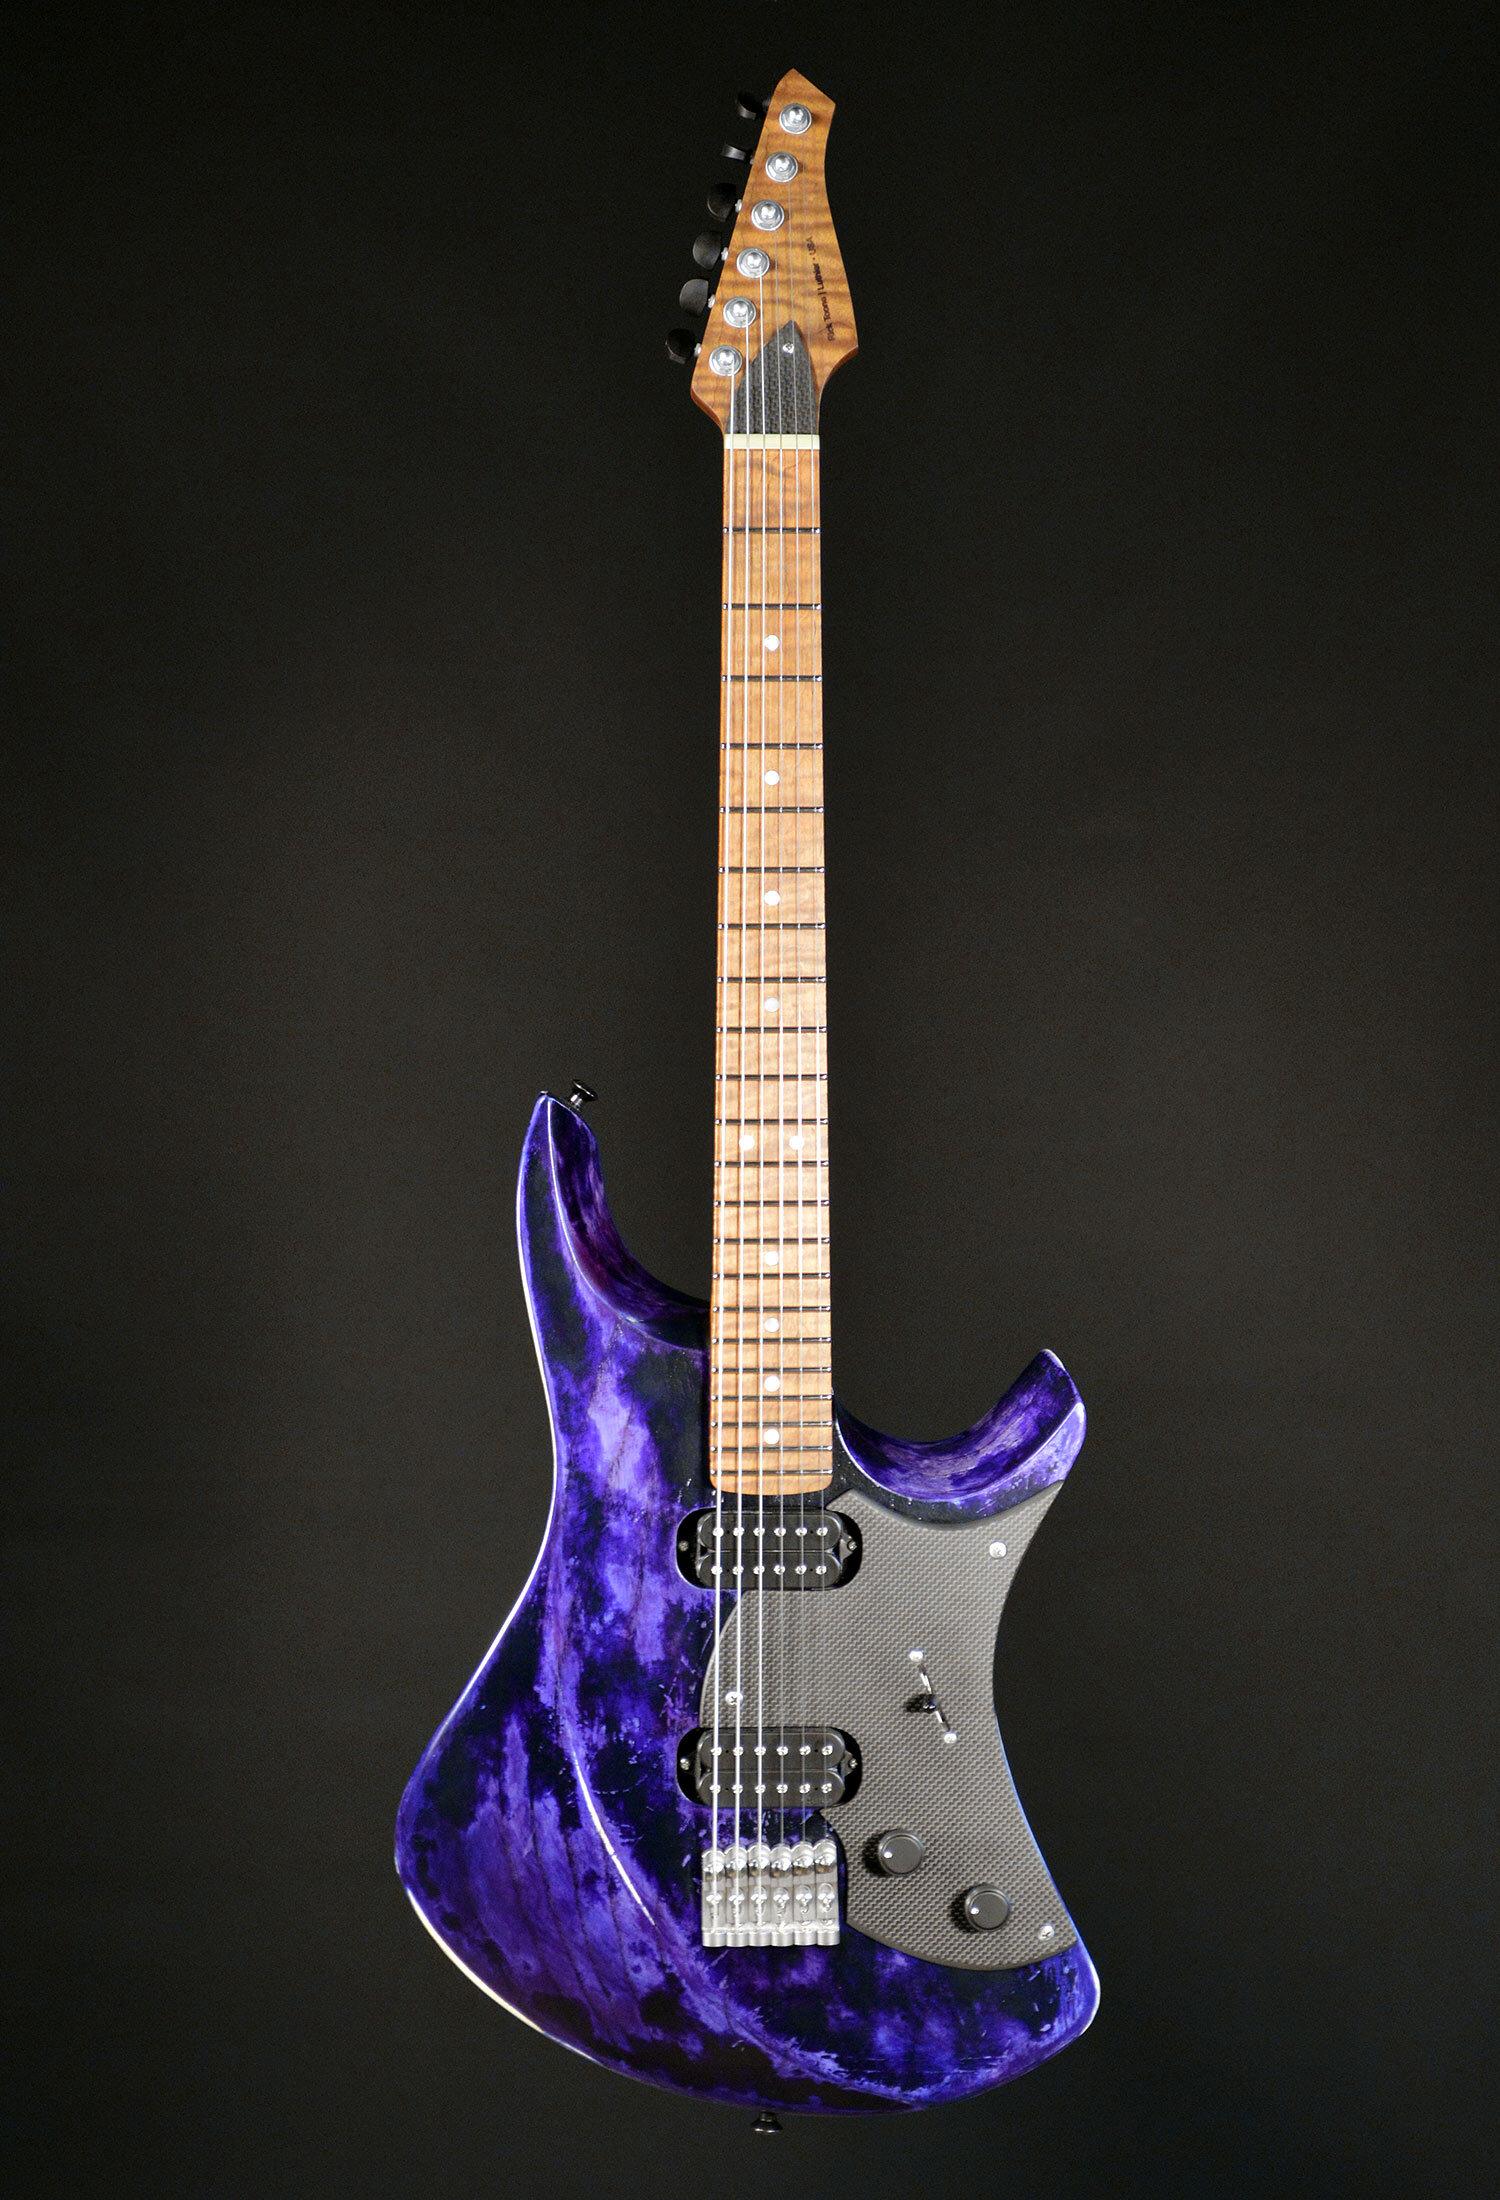 PHOTO: Goshawk™ 6-string guitar.